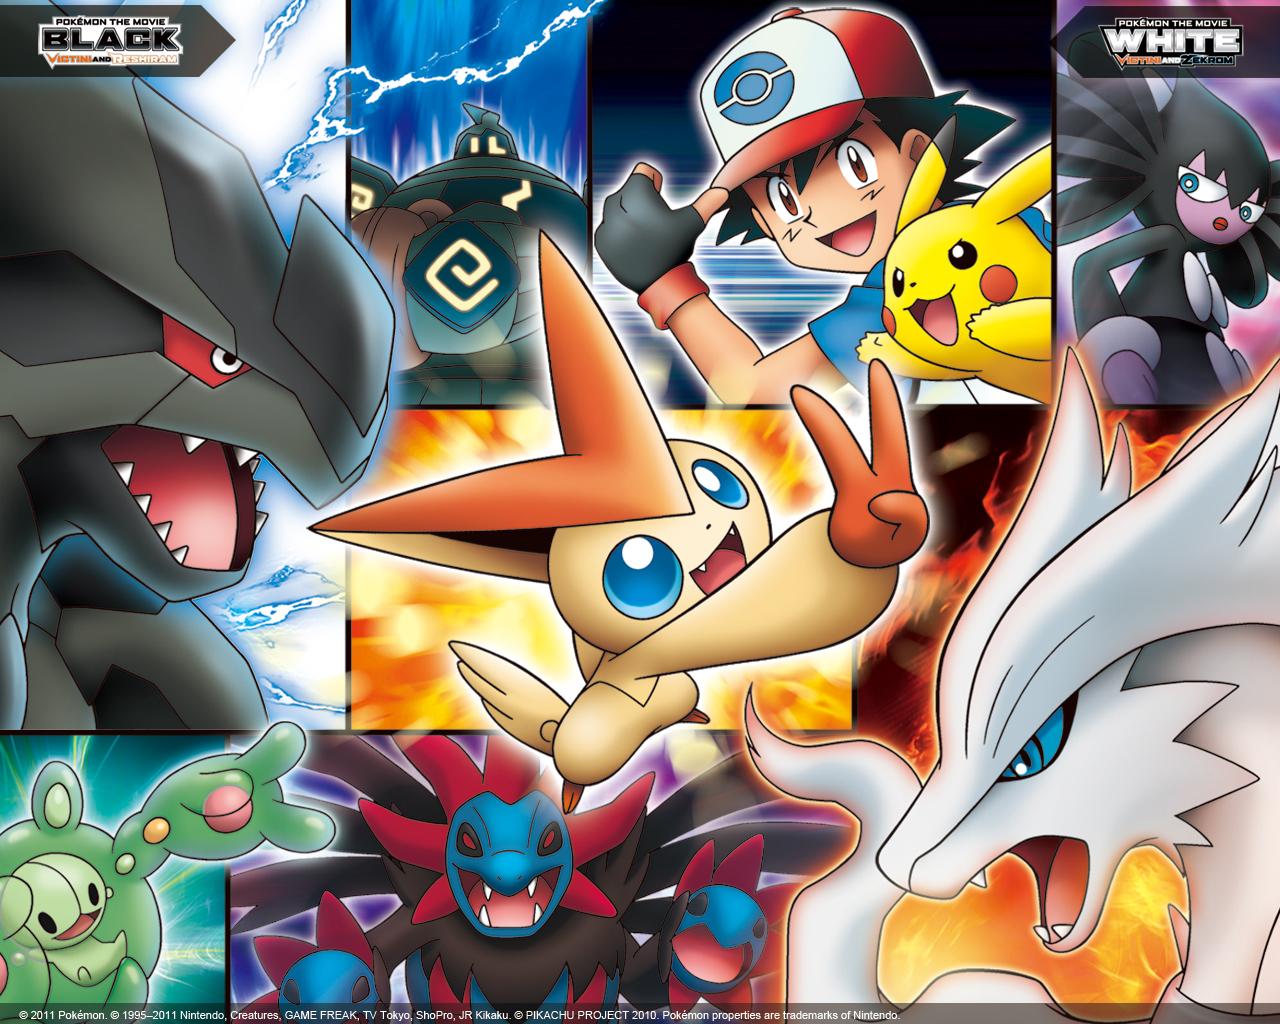 Pokémon the Movie Wallpapers Pocketmonsters Net